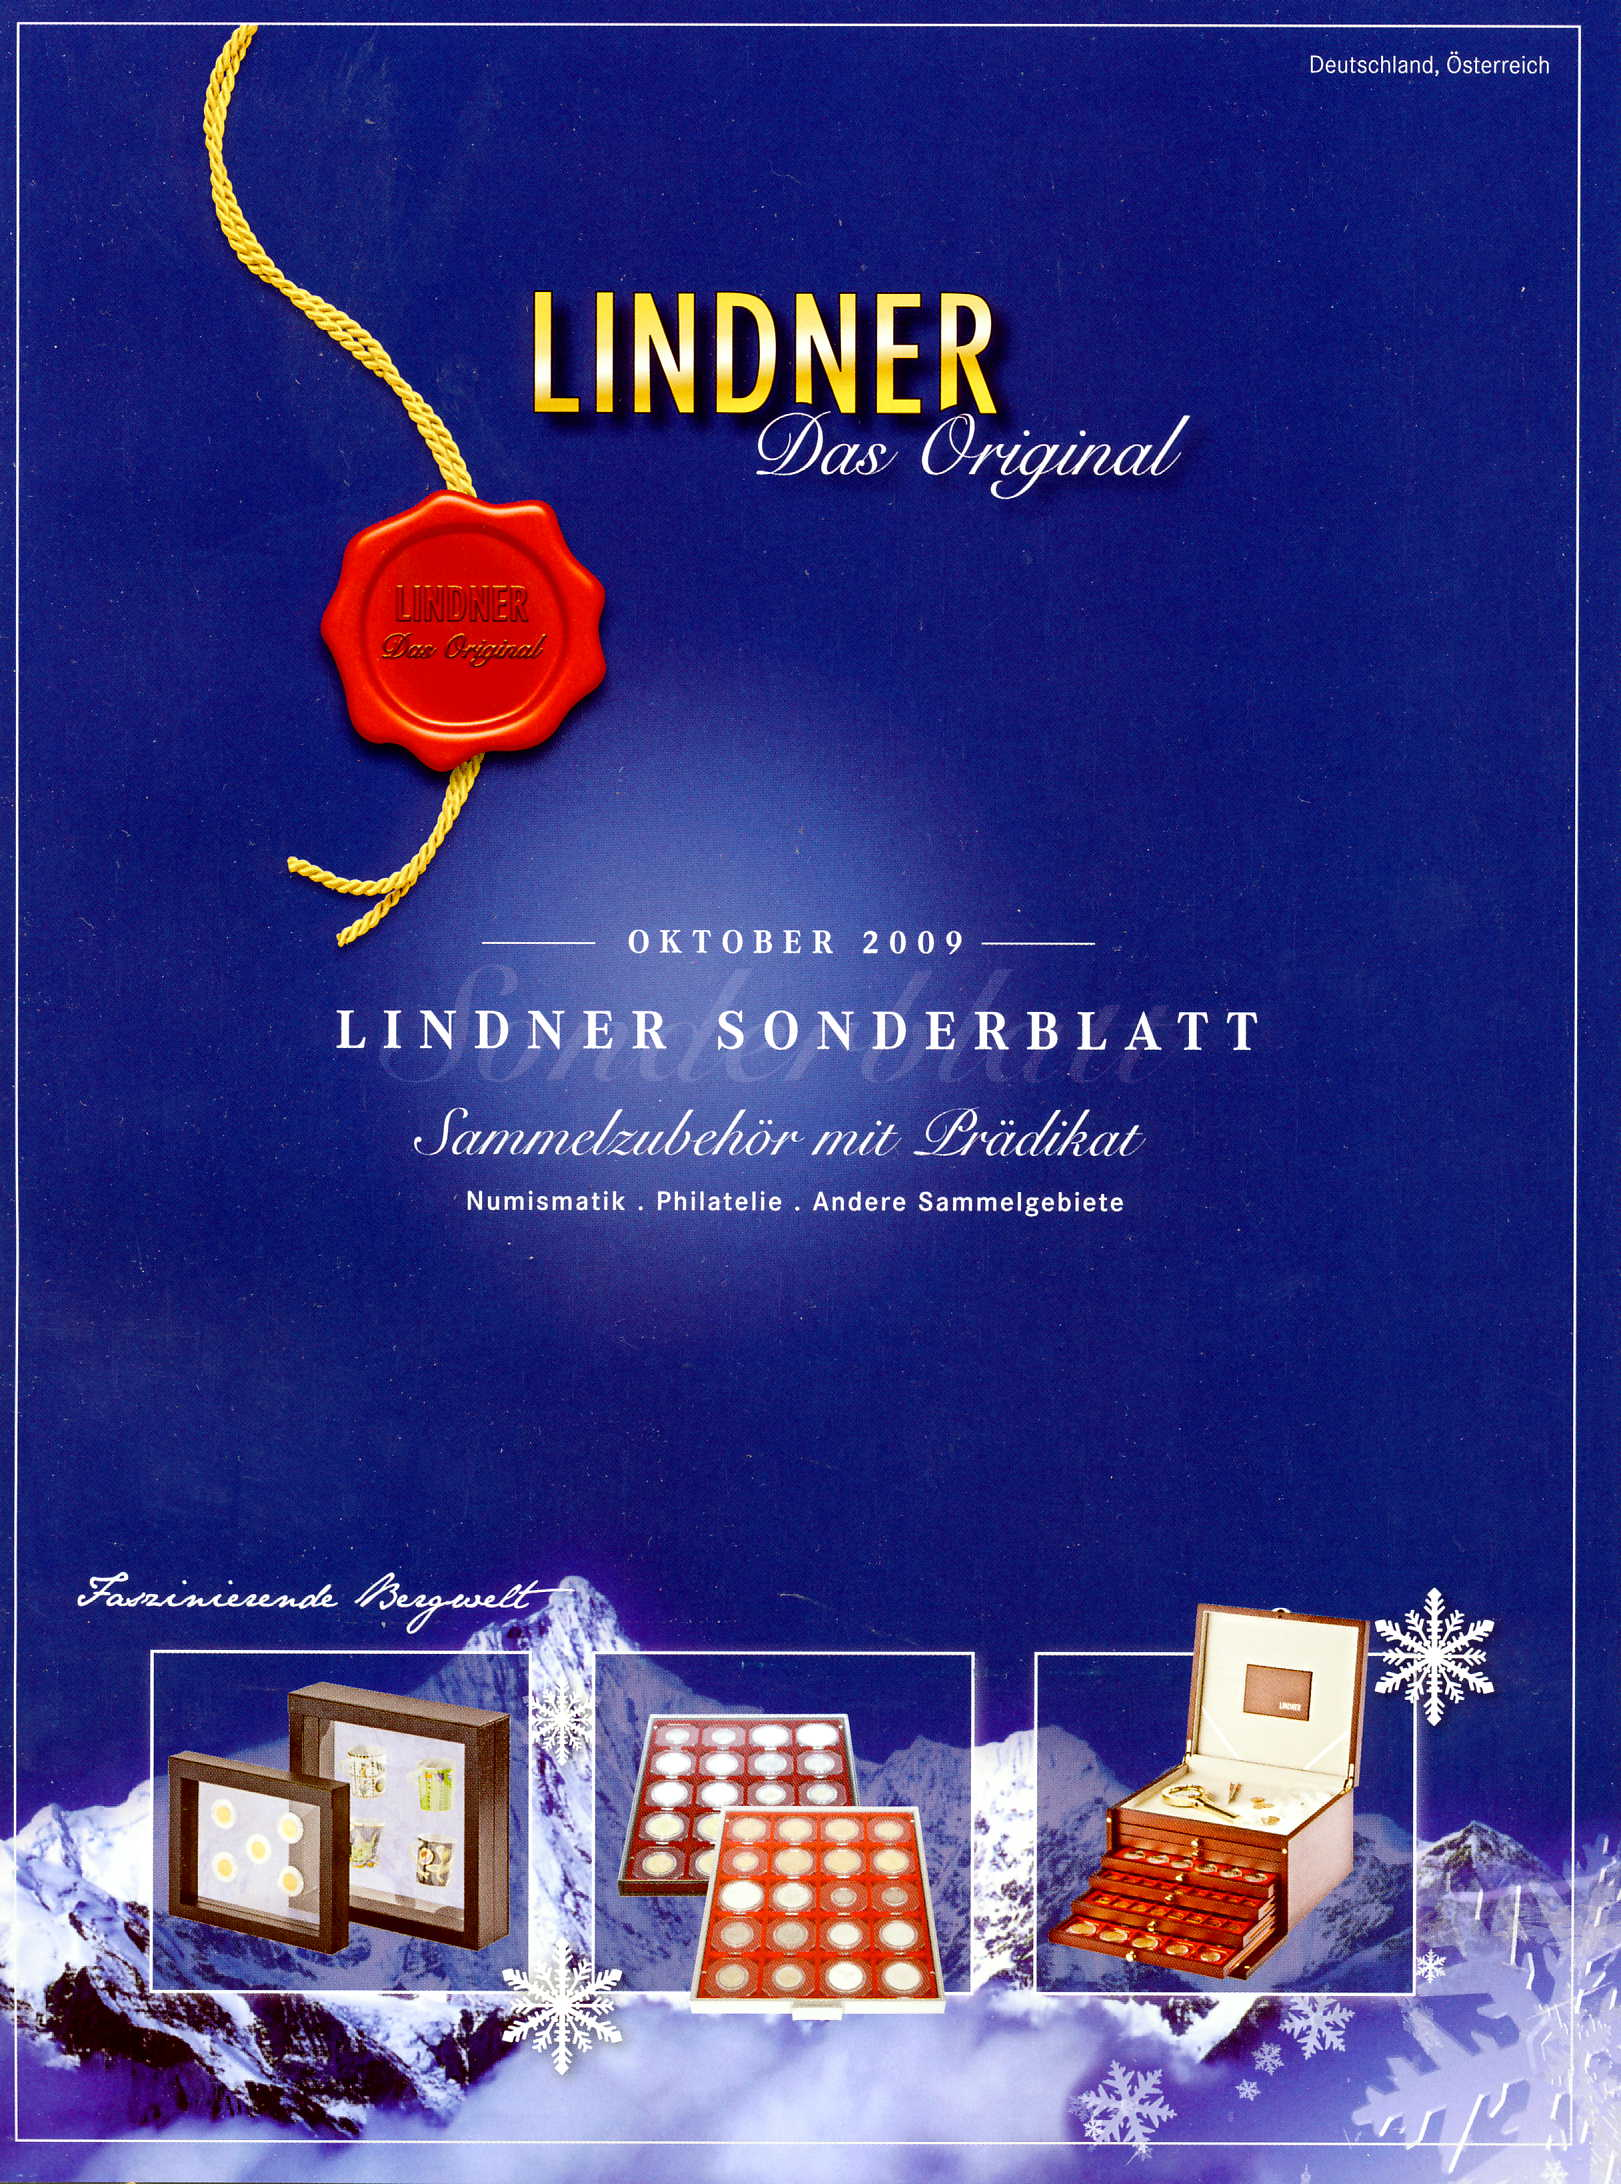 Lindner Sonderblatt Oktober 2009 Preisliste für Sammelzubehör mi